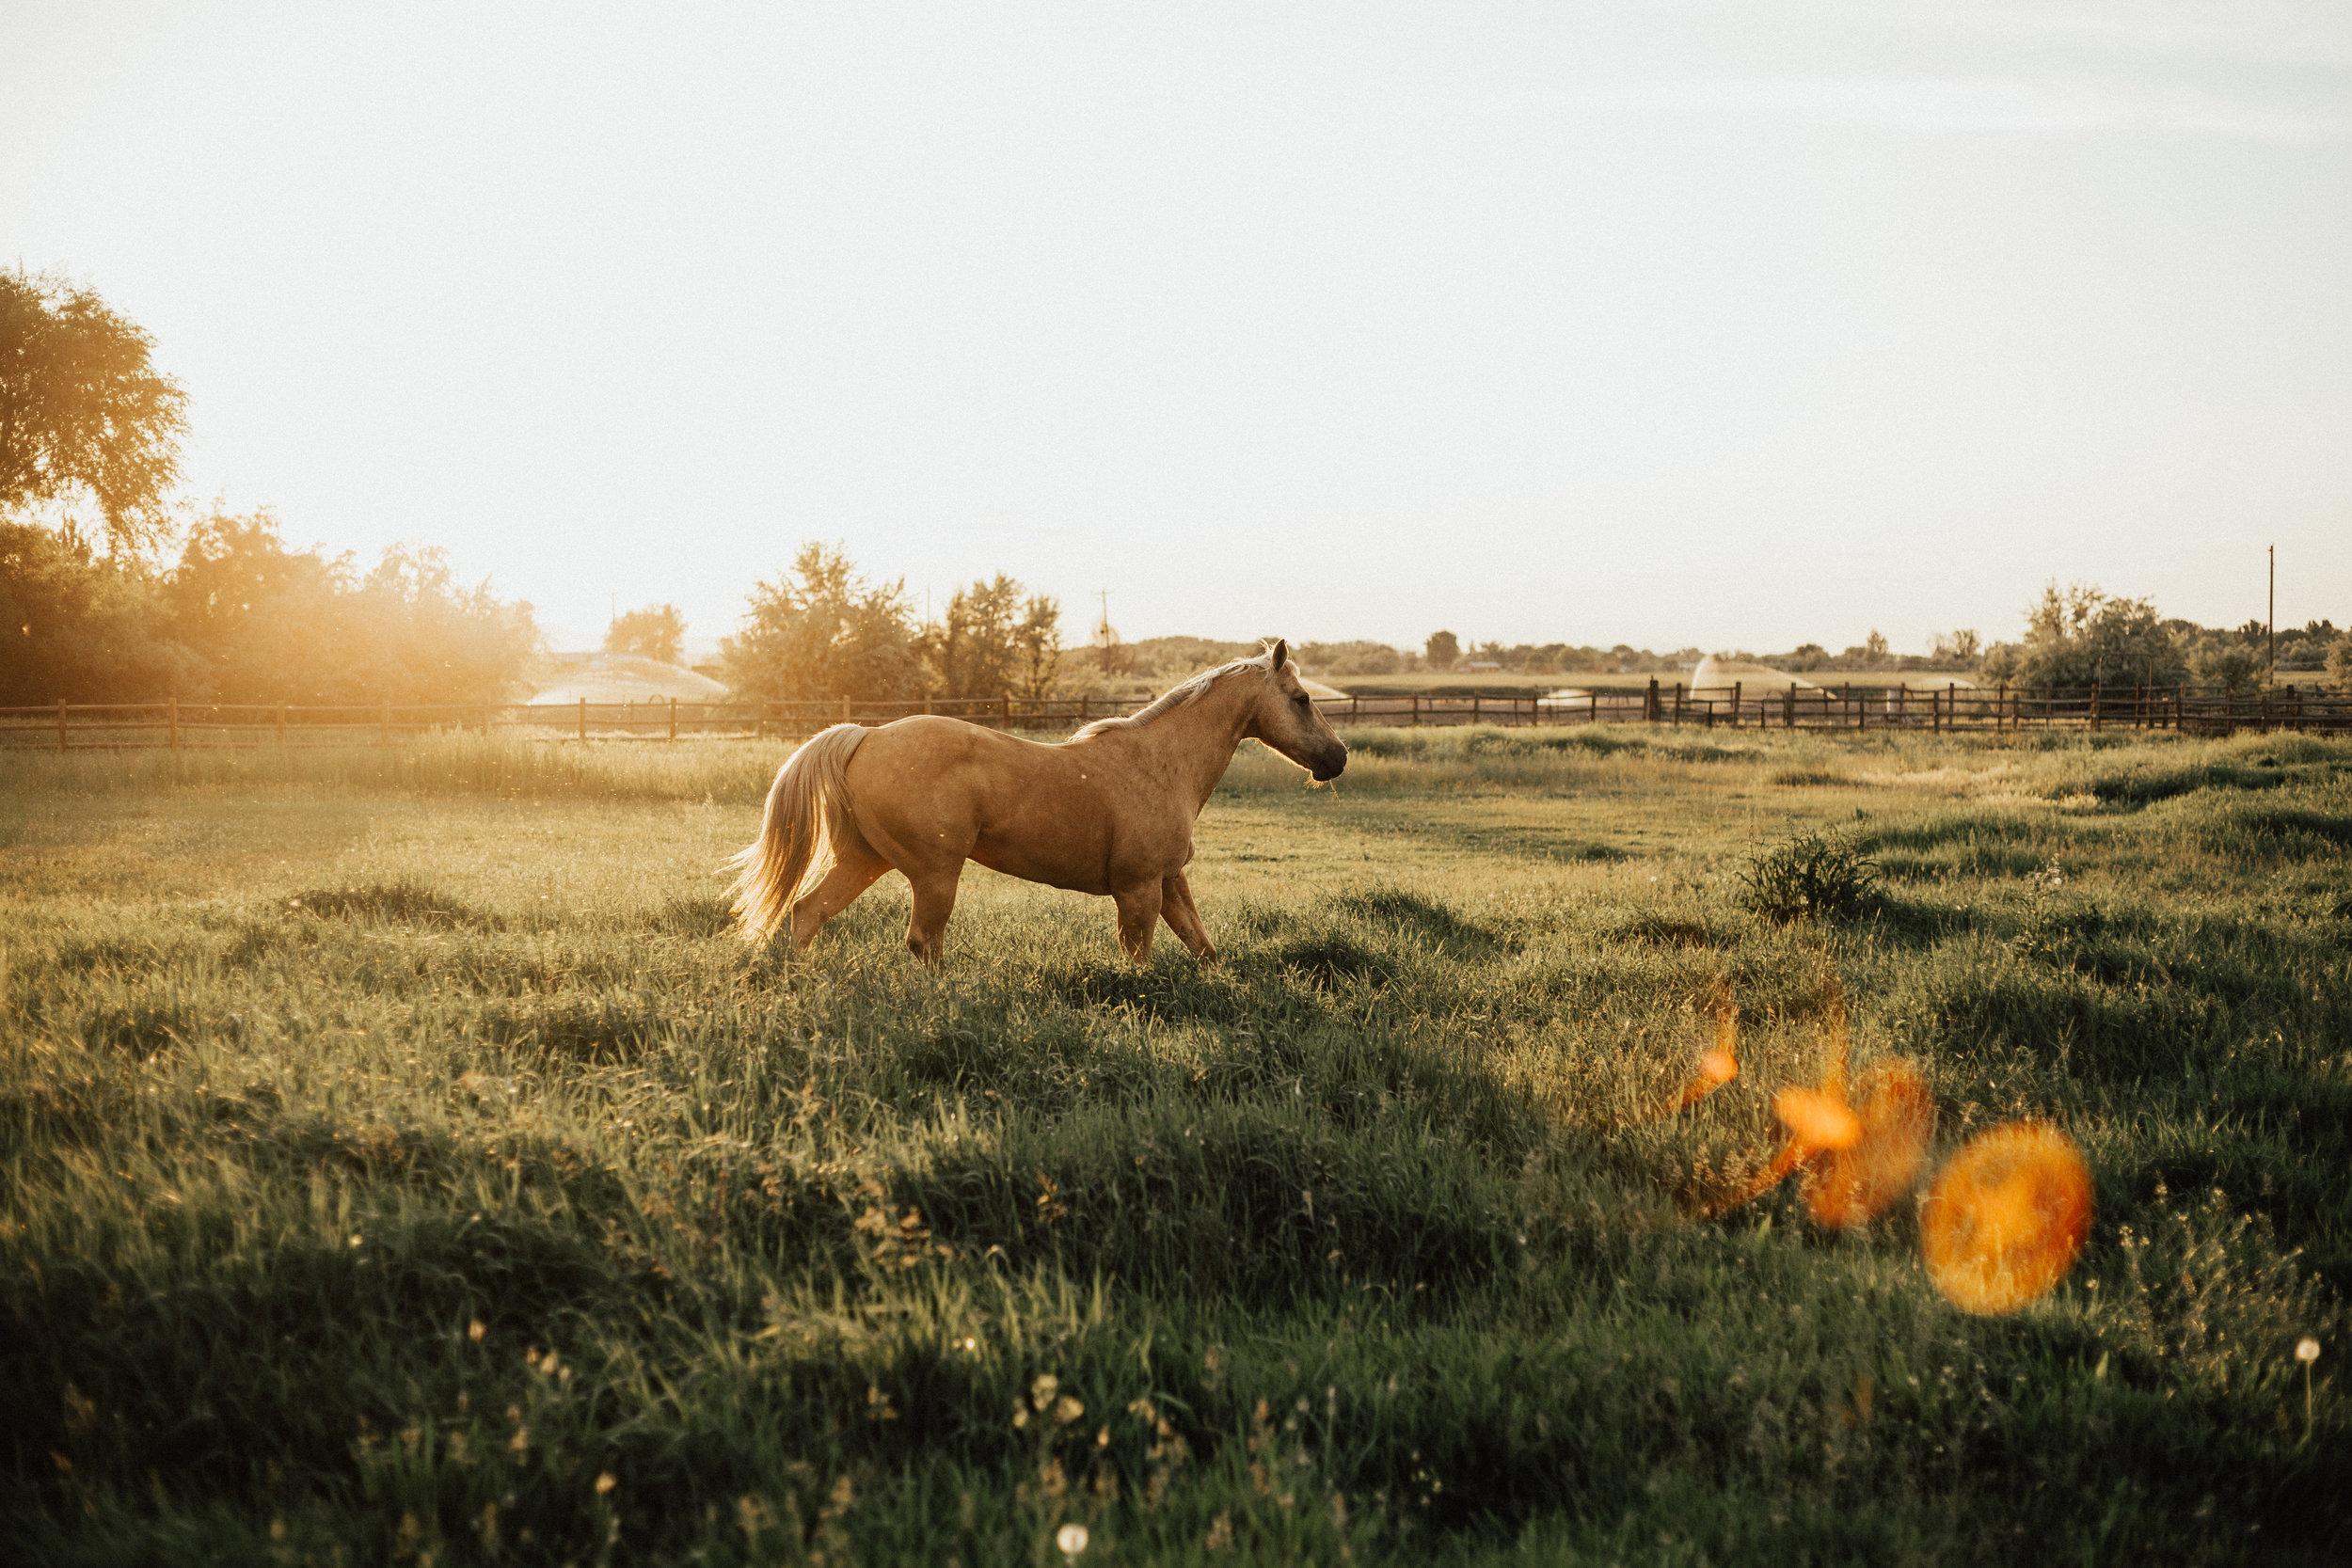 Western_Styled_Shoot-69.jpg